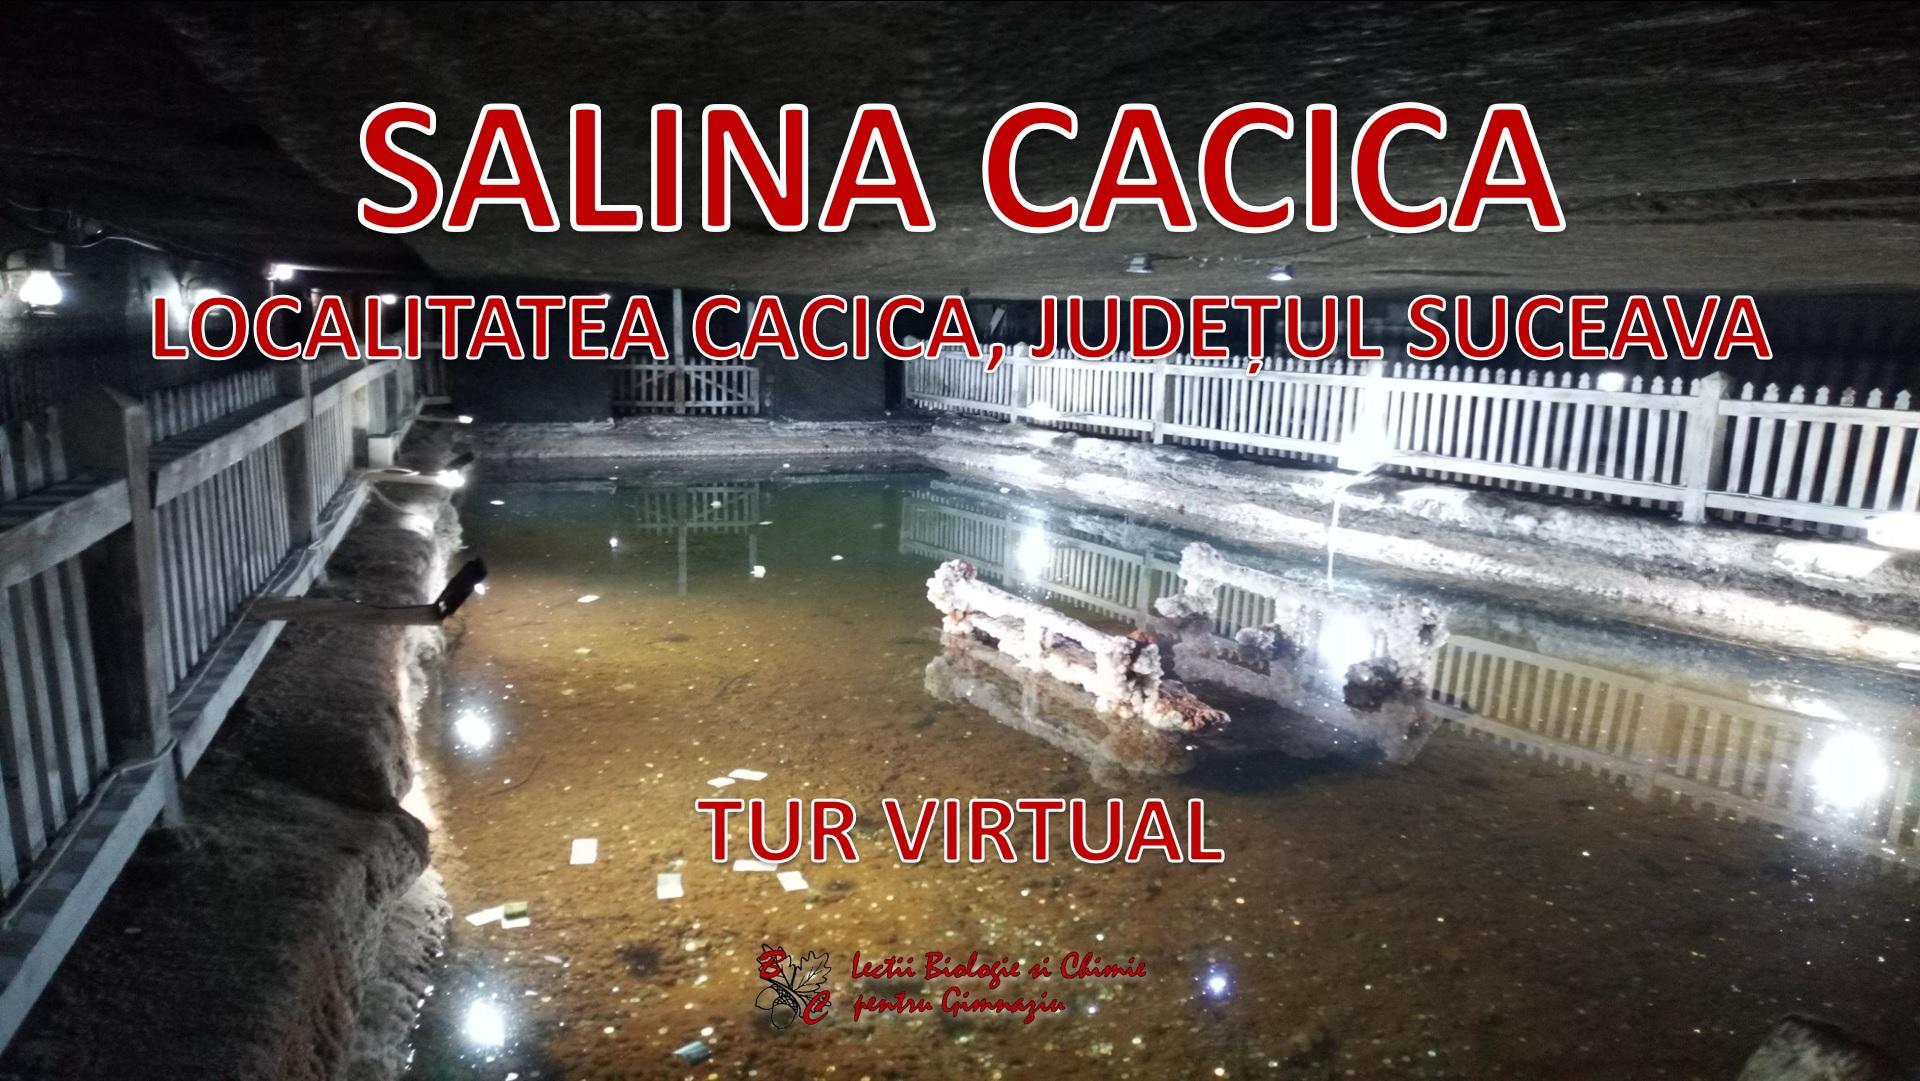 Salina Cacica